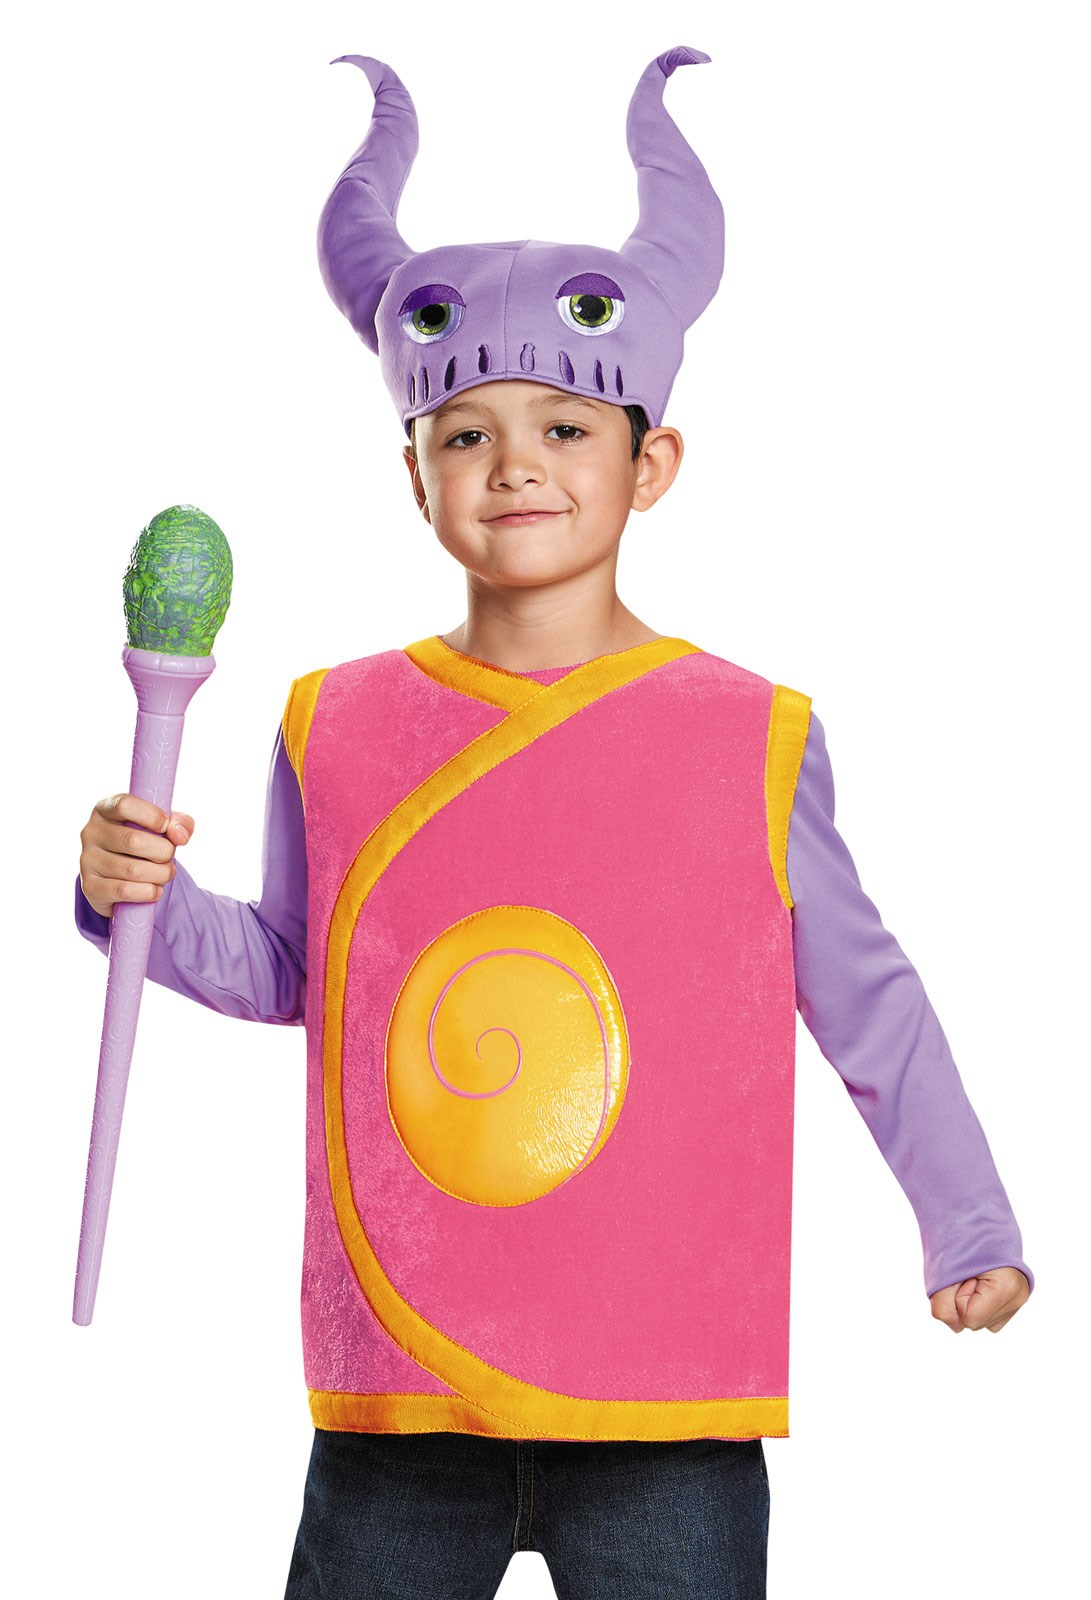 Dreamworks Home: Kids Captain Smek Costume